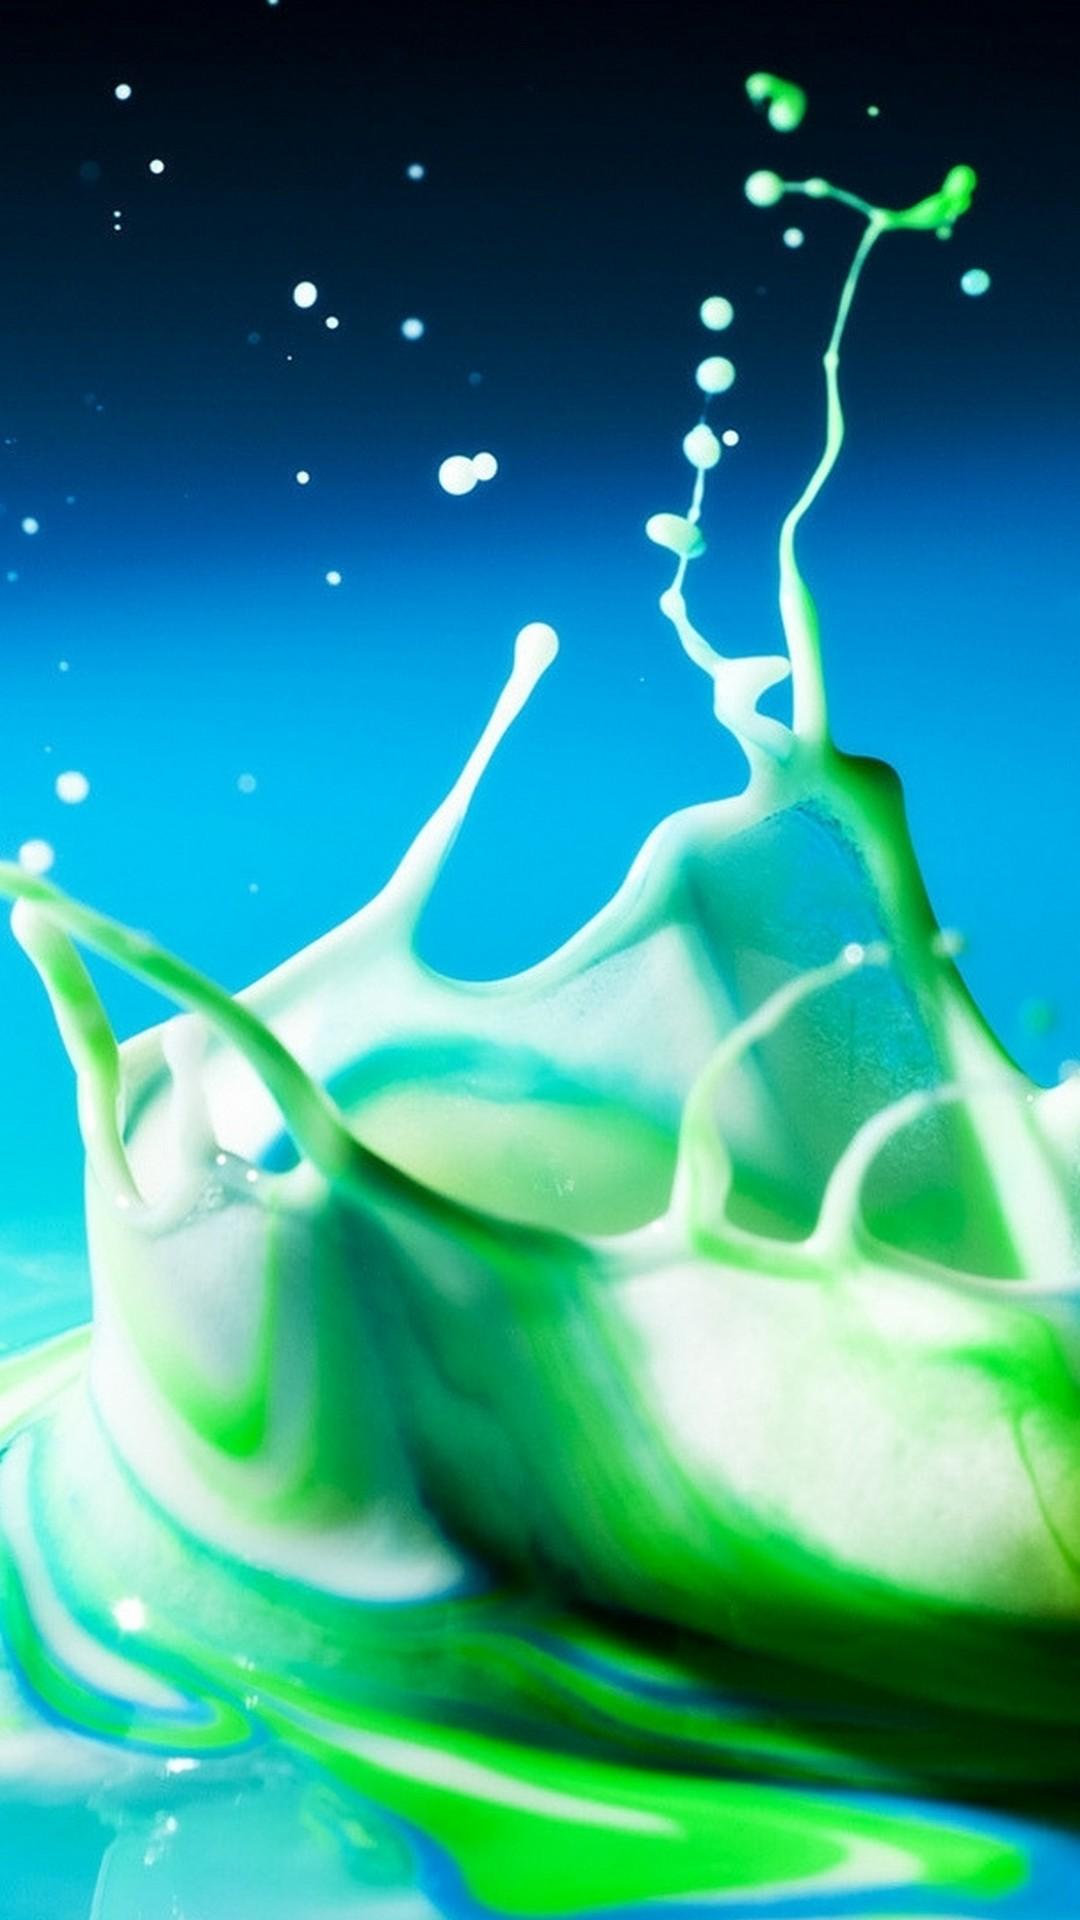 Free Milky Green Liquid Wallpaper IPhone X 2019 3D